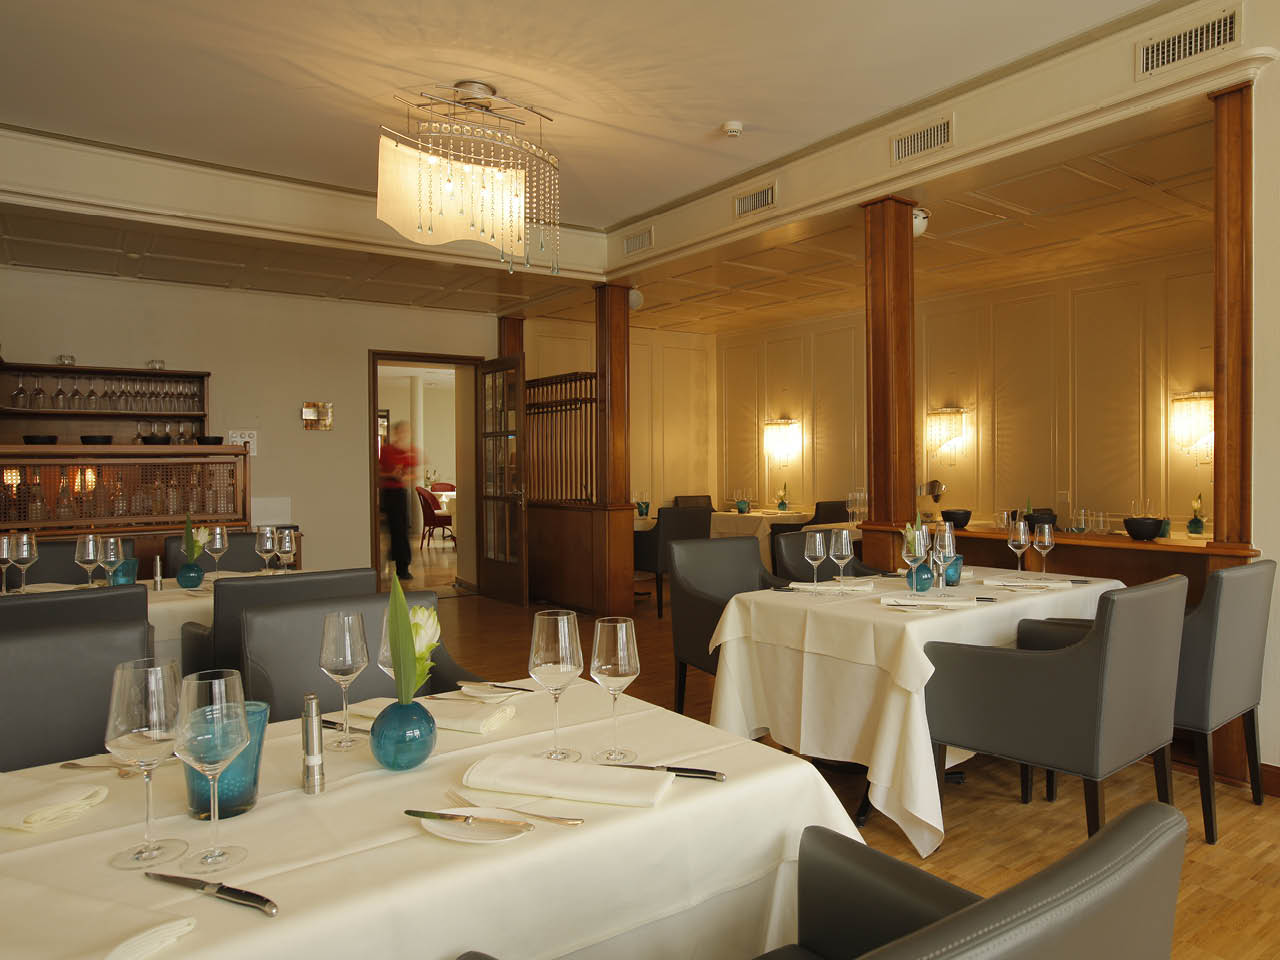 Zfv tag der offenen t r im sorell hotel krone in winterthur for Sorell hotel krone